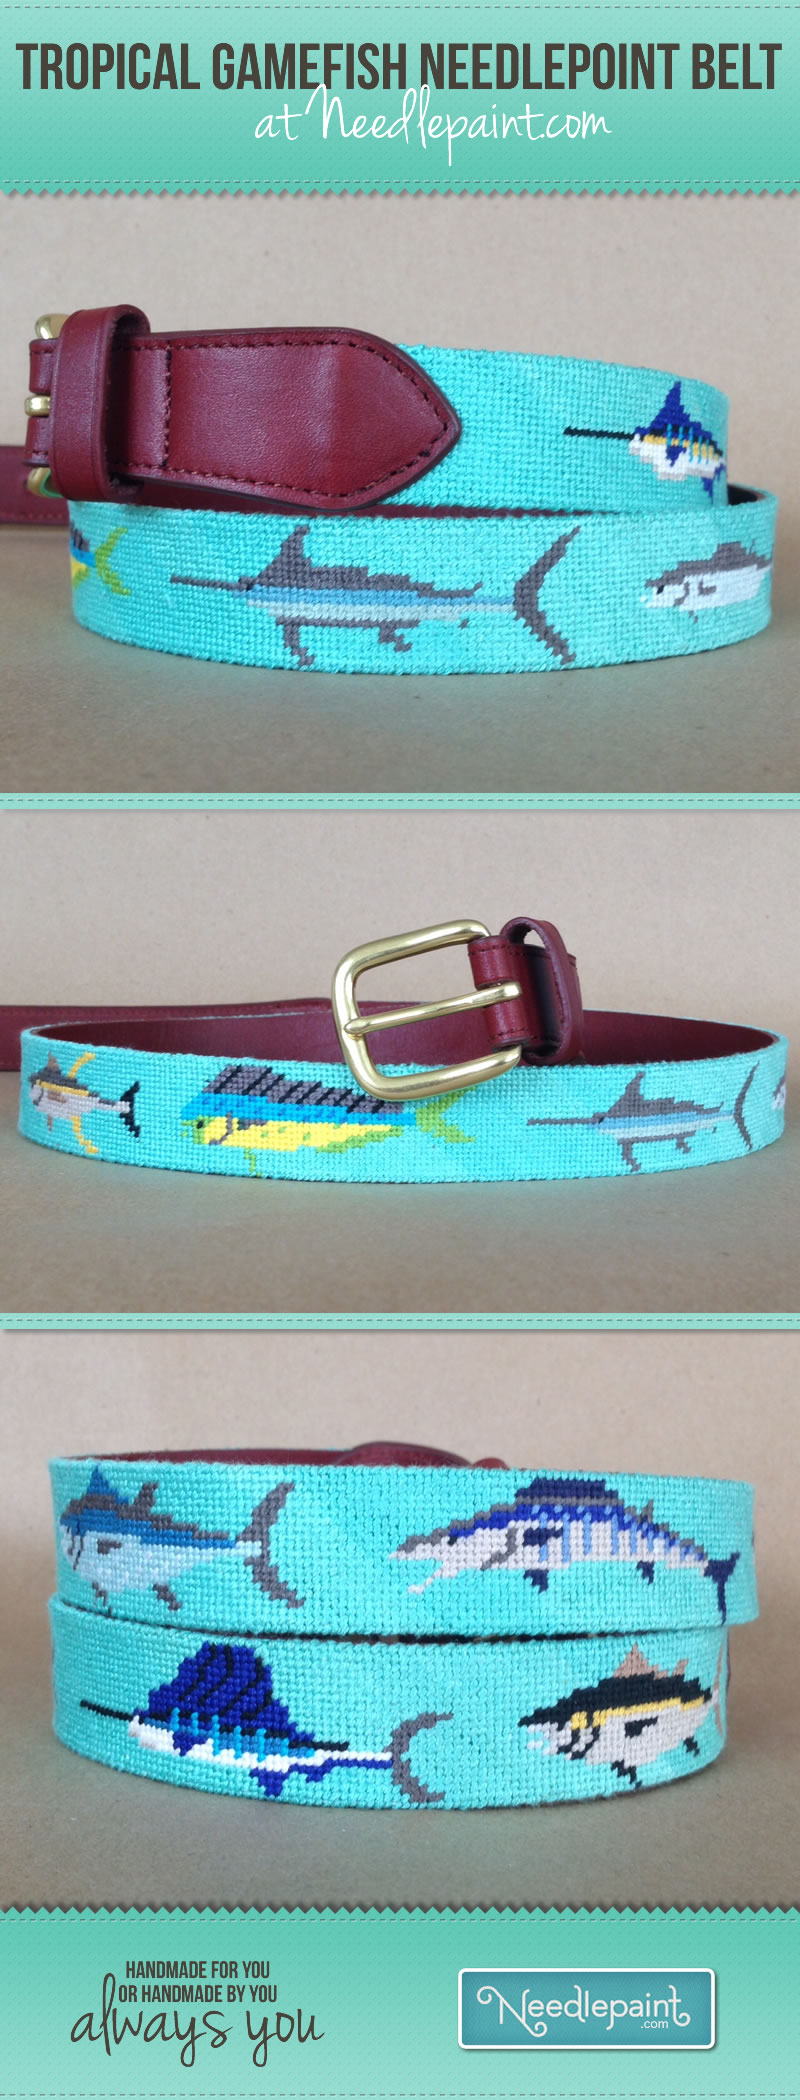 Tropical Gamefish Needlepoint Belt